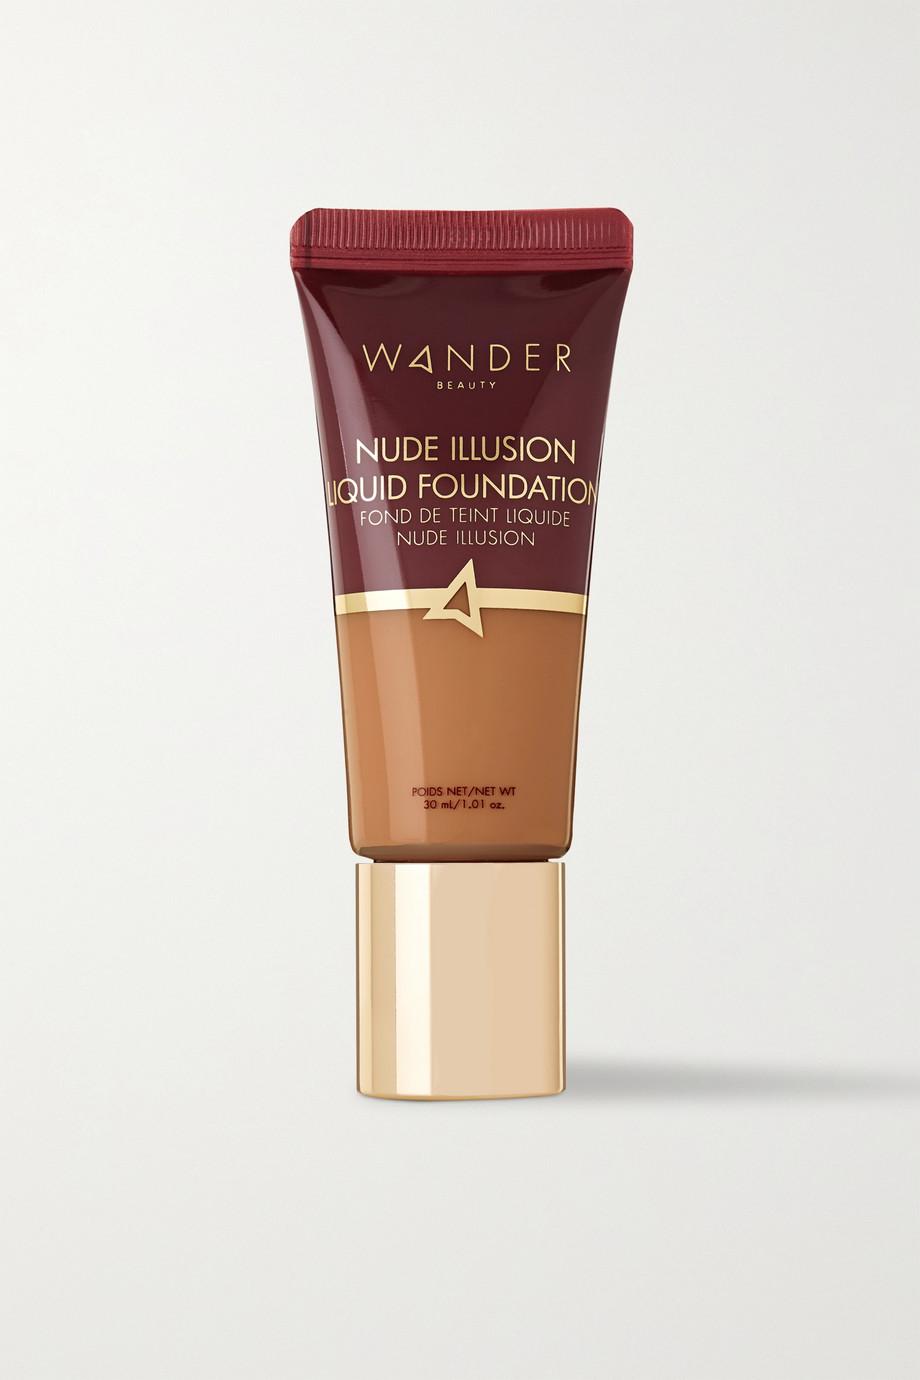 Wander Beauty Nude Illusion Liquid Foundation – Golden Tan – Foundation